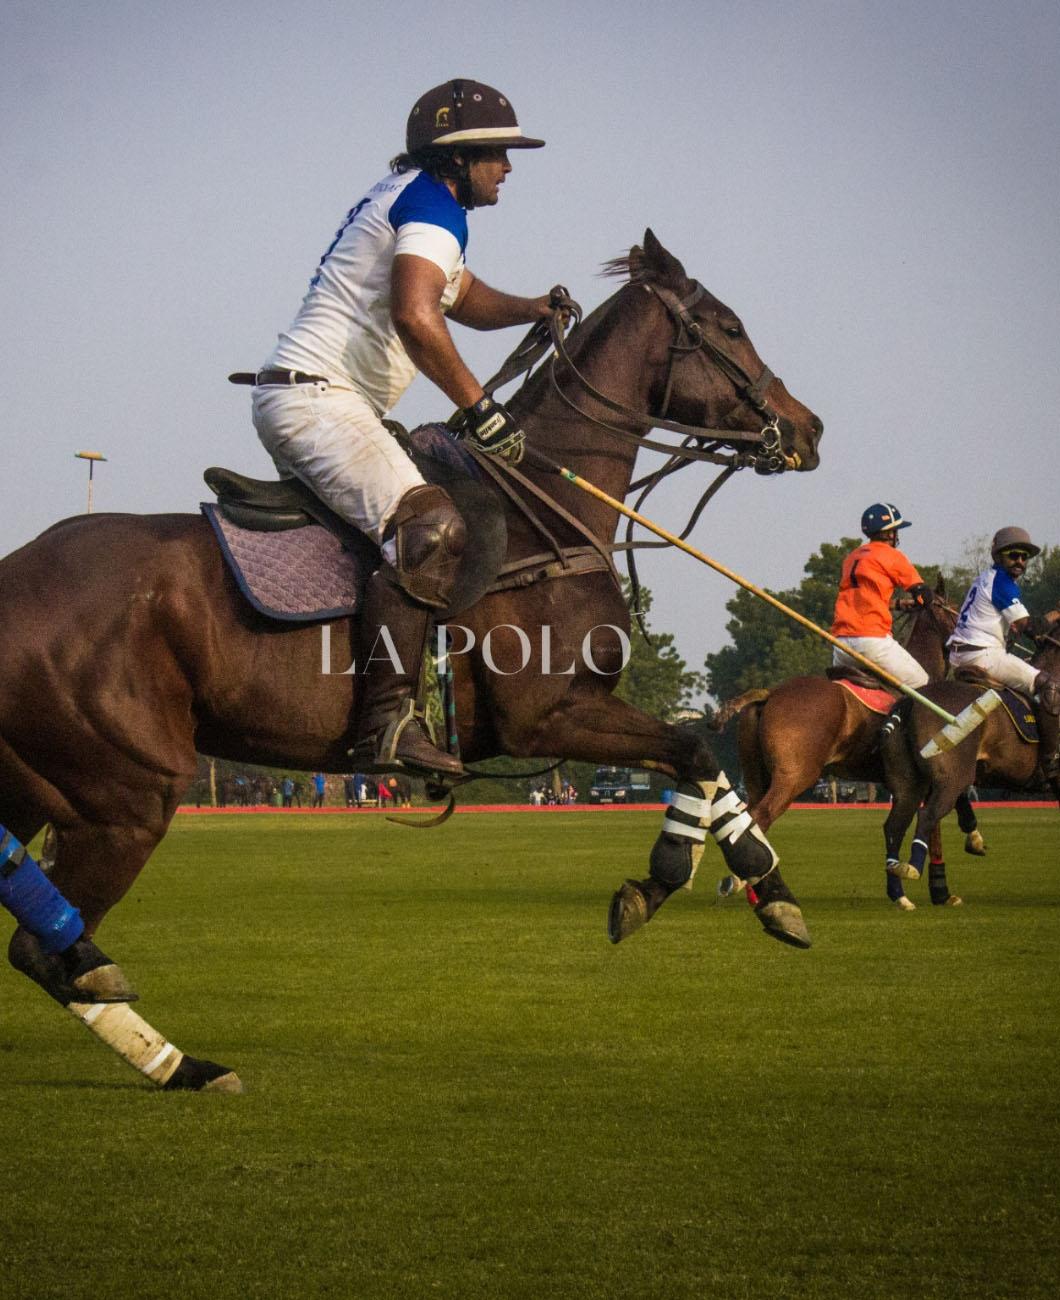 Vertical-2-jodhpur-polo-team-la-polo